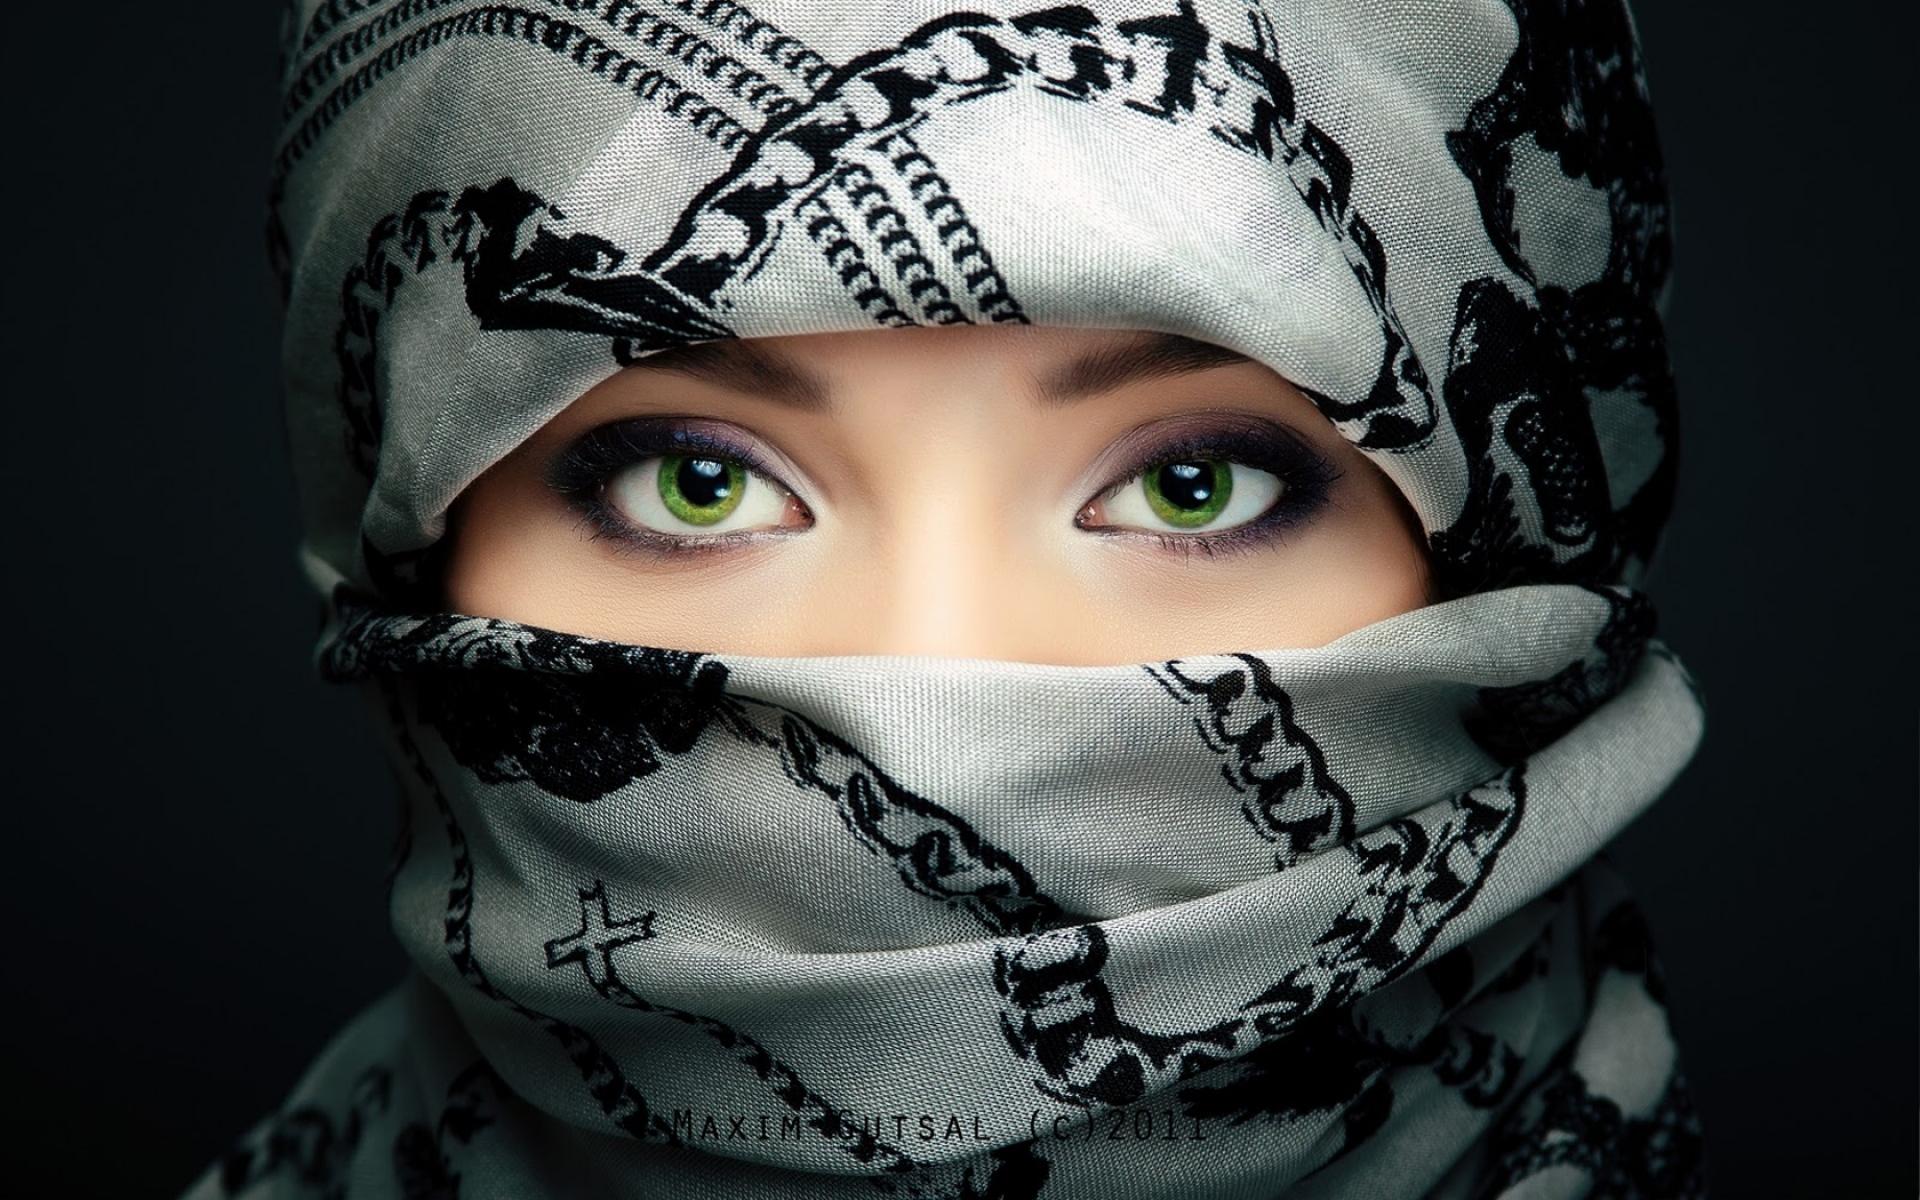 Картинки Девушка, шарф, глаза фото и обои на рабочий стол